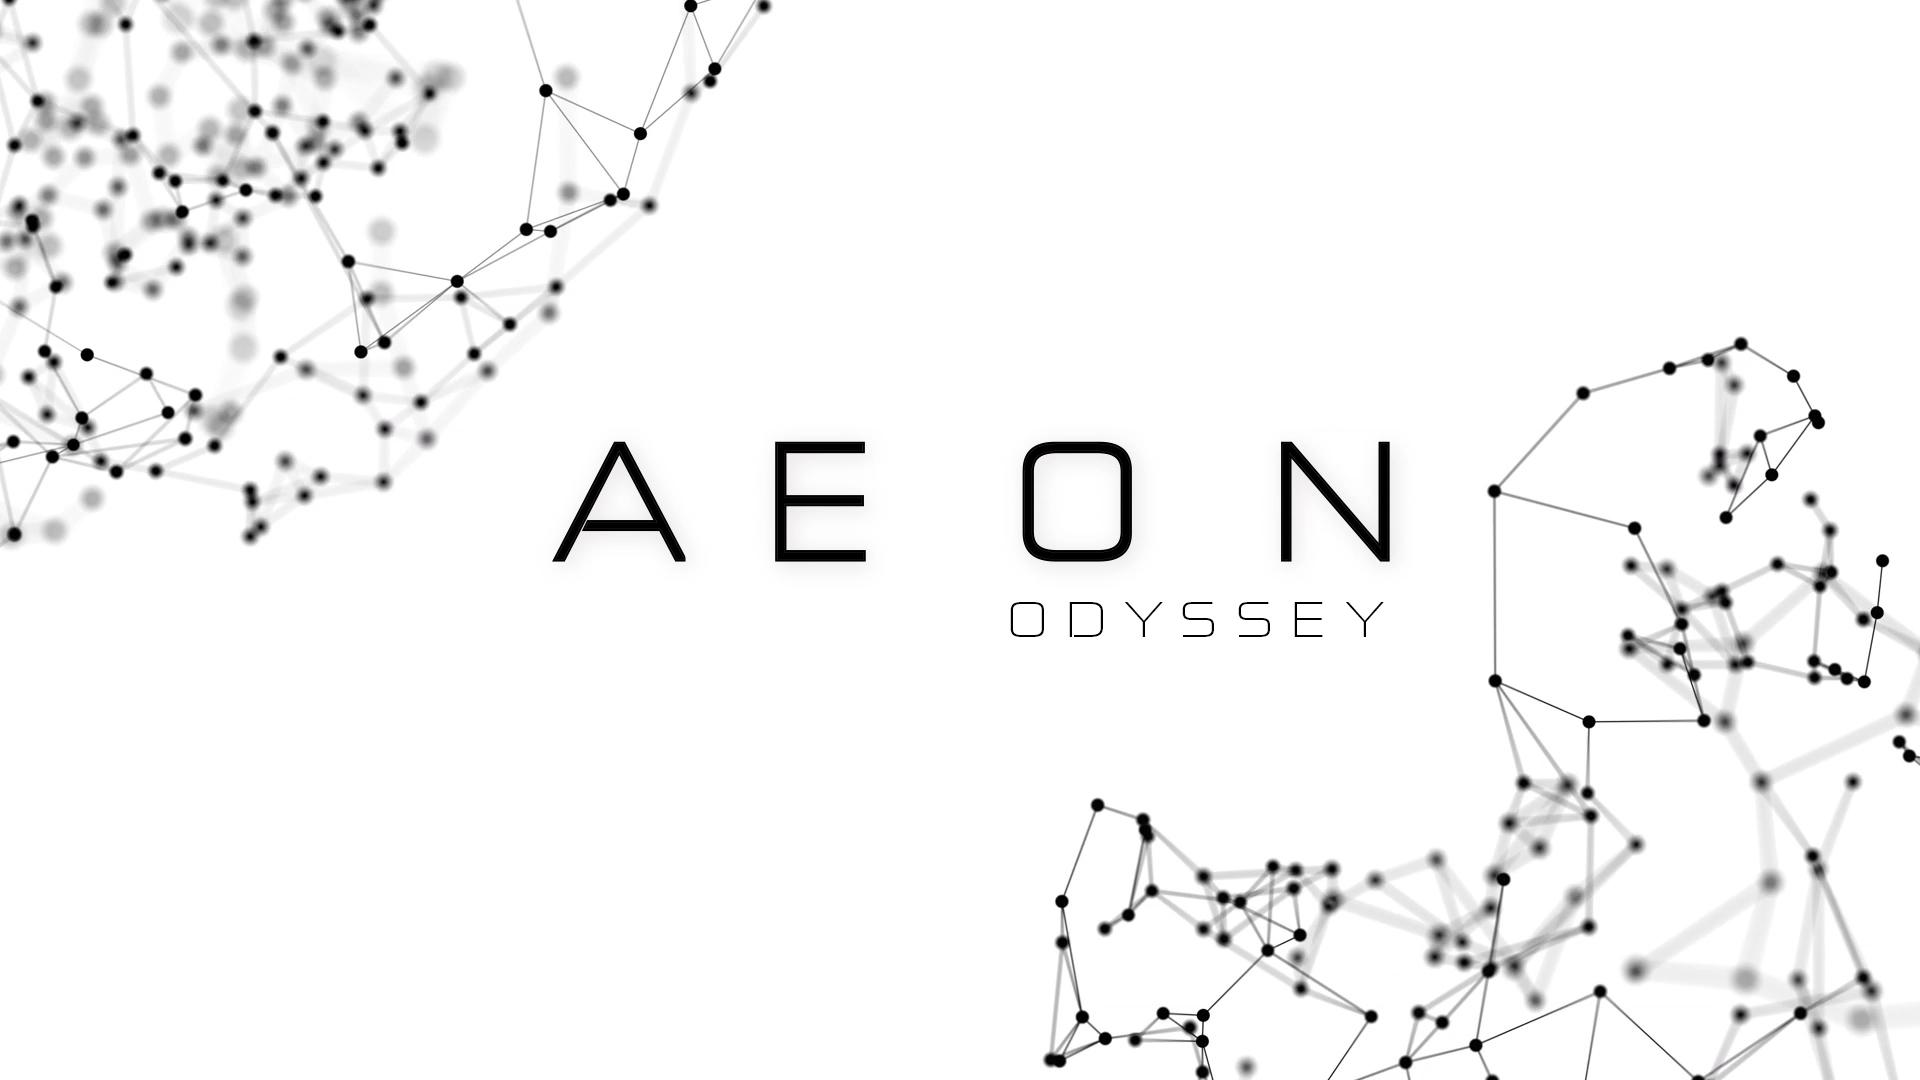 Aeon-odyssey.jpg